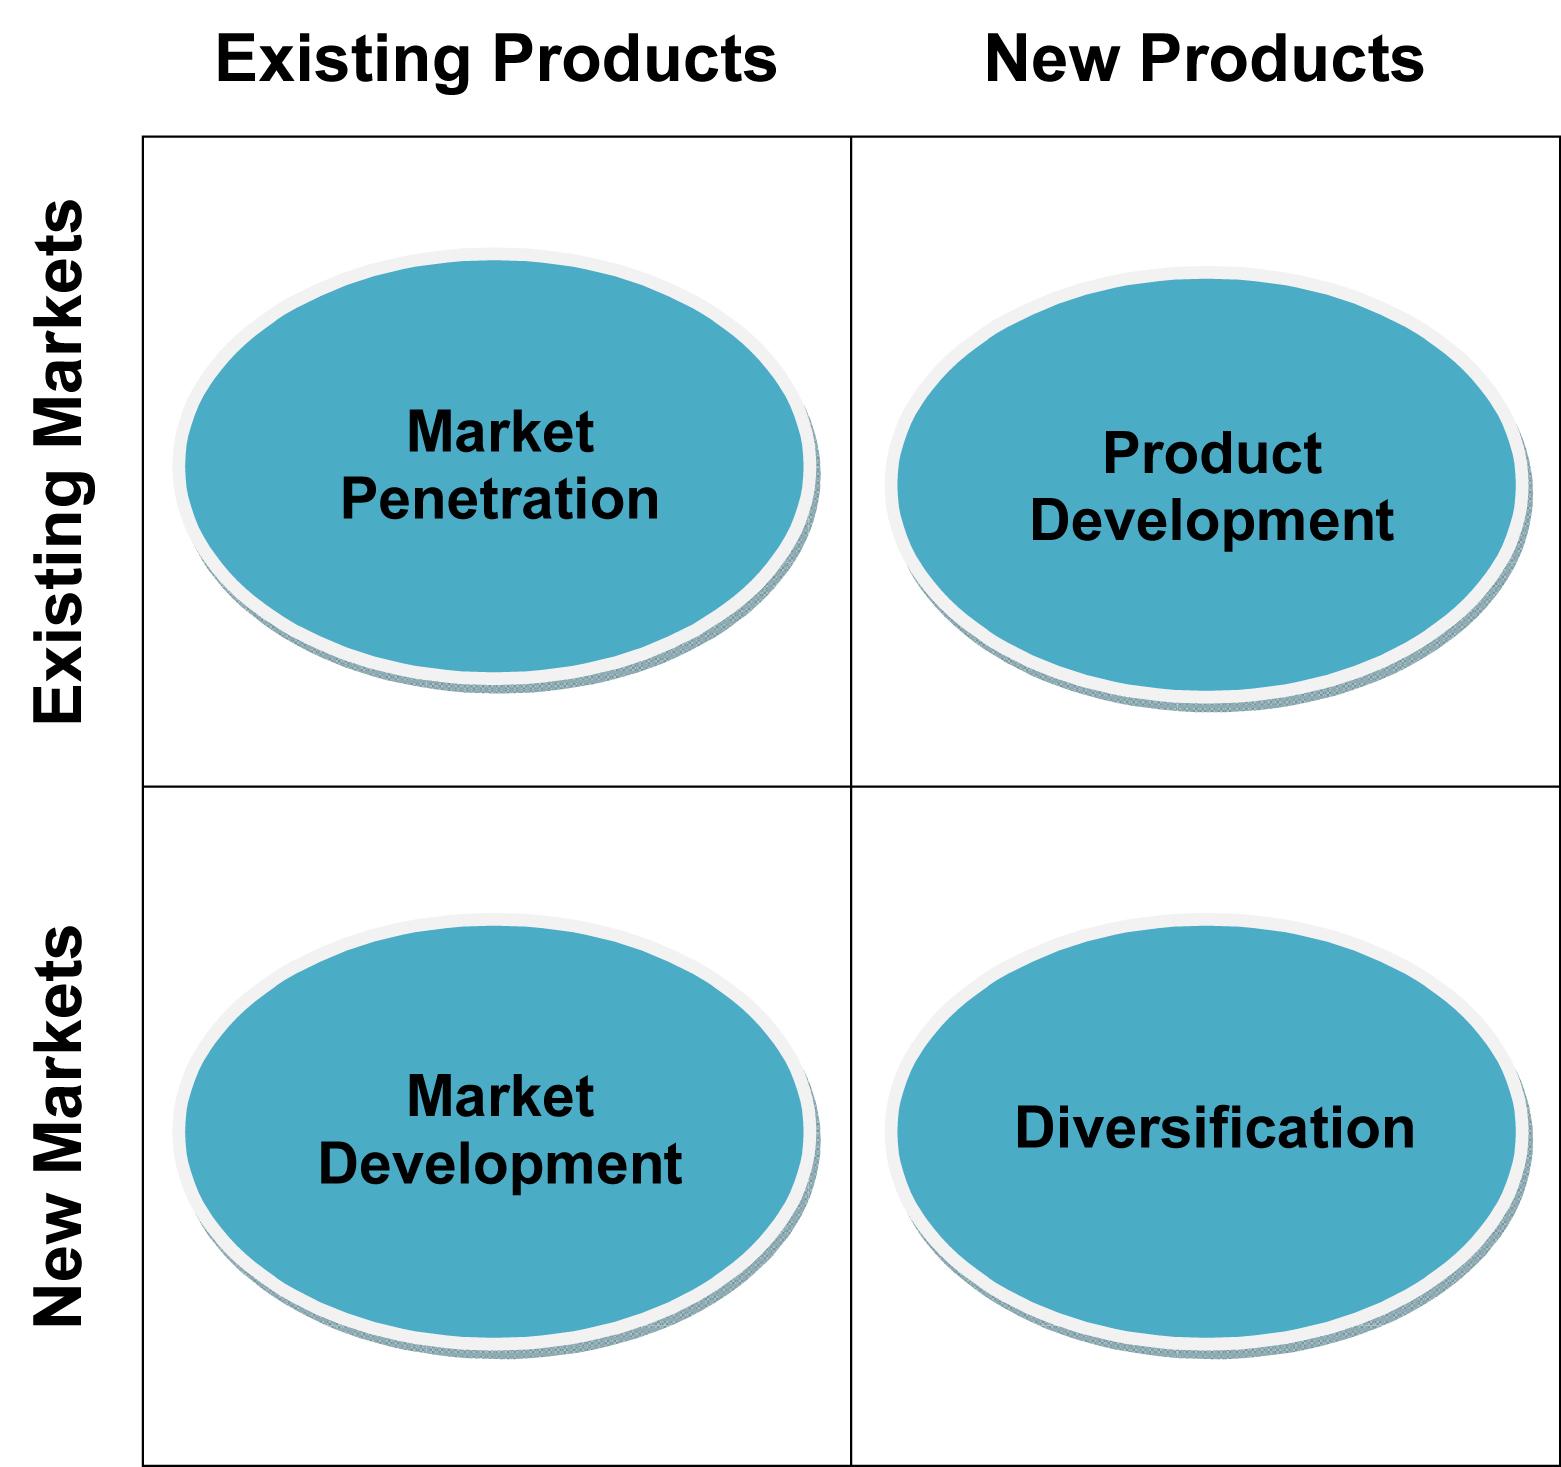 (http://contarmedia.com/wp-content/uploads/2009/02/ansoff-matrix-table.jpg)